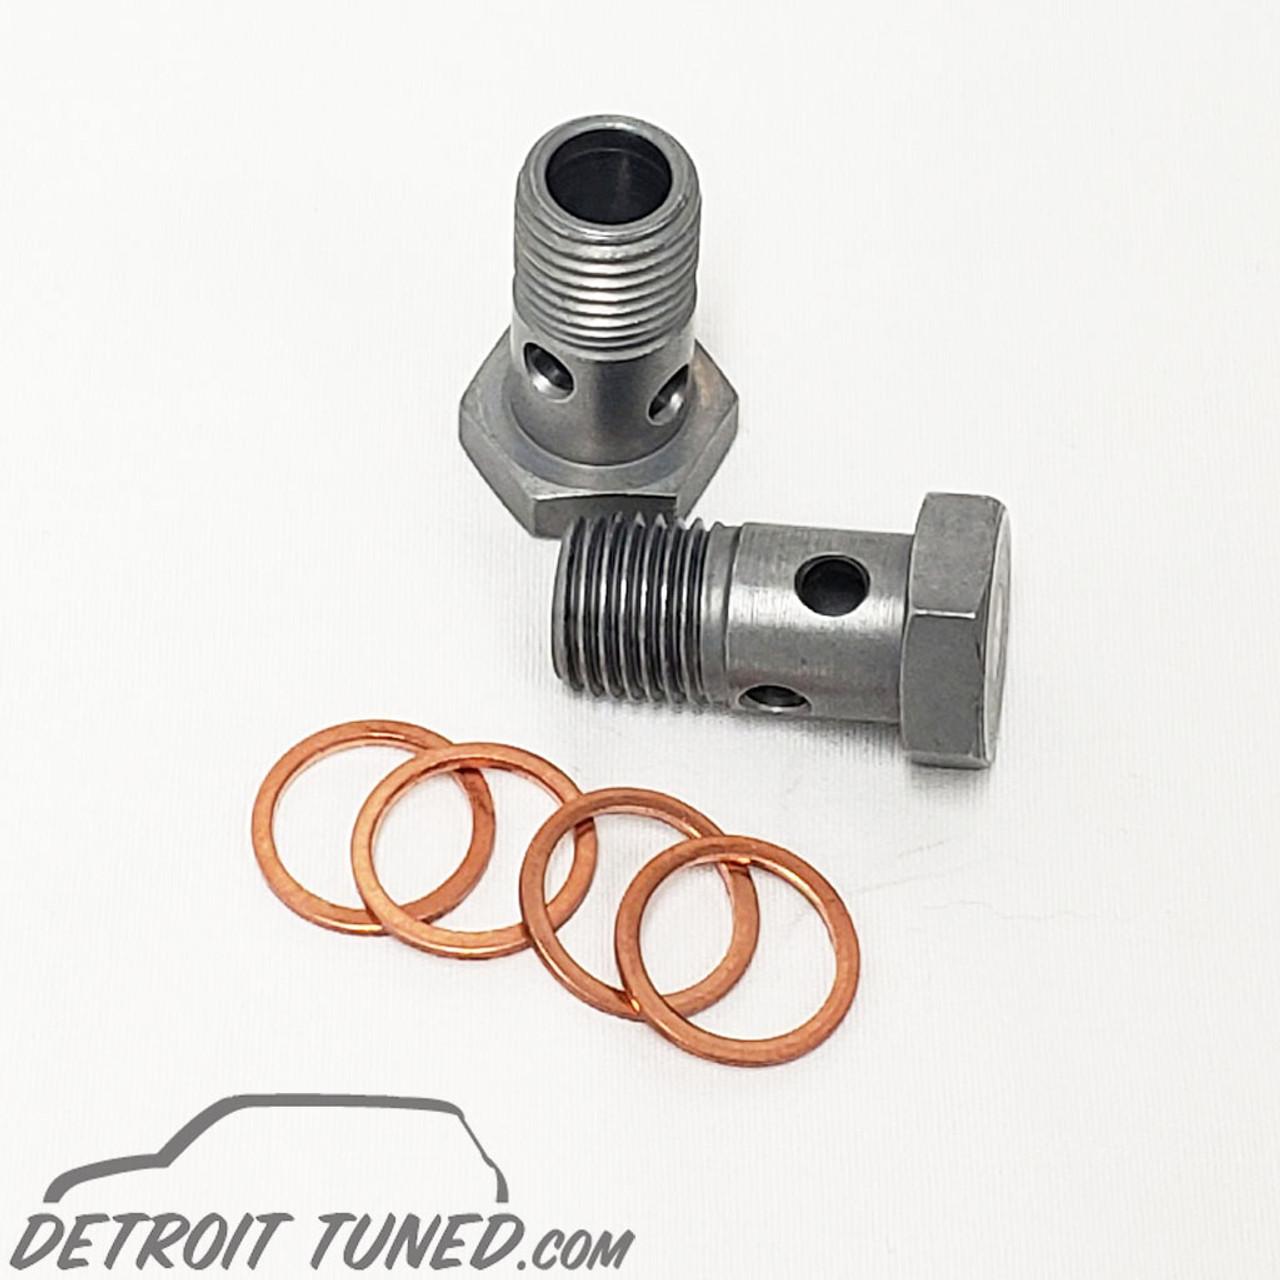 Mini Cooper S Turbo Coolant Line Banjo Bolts